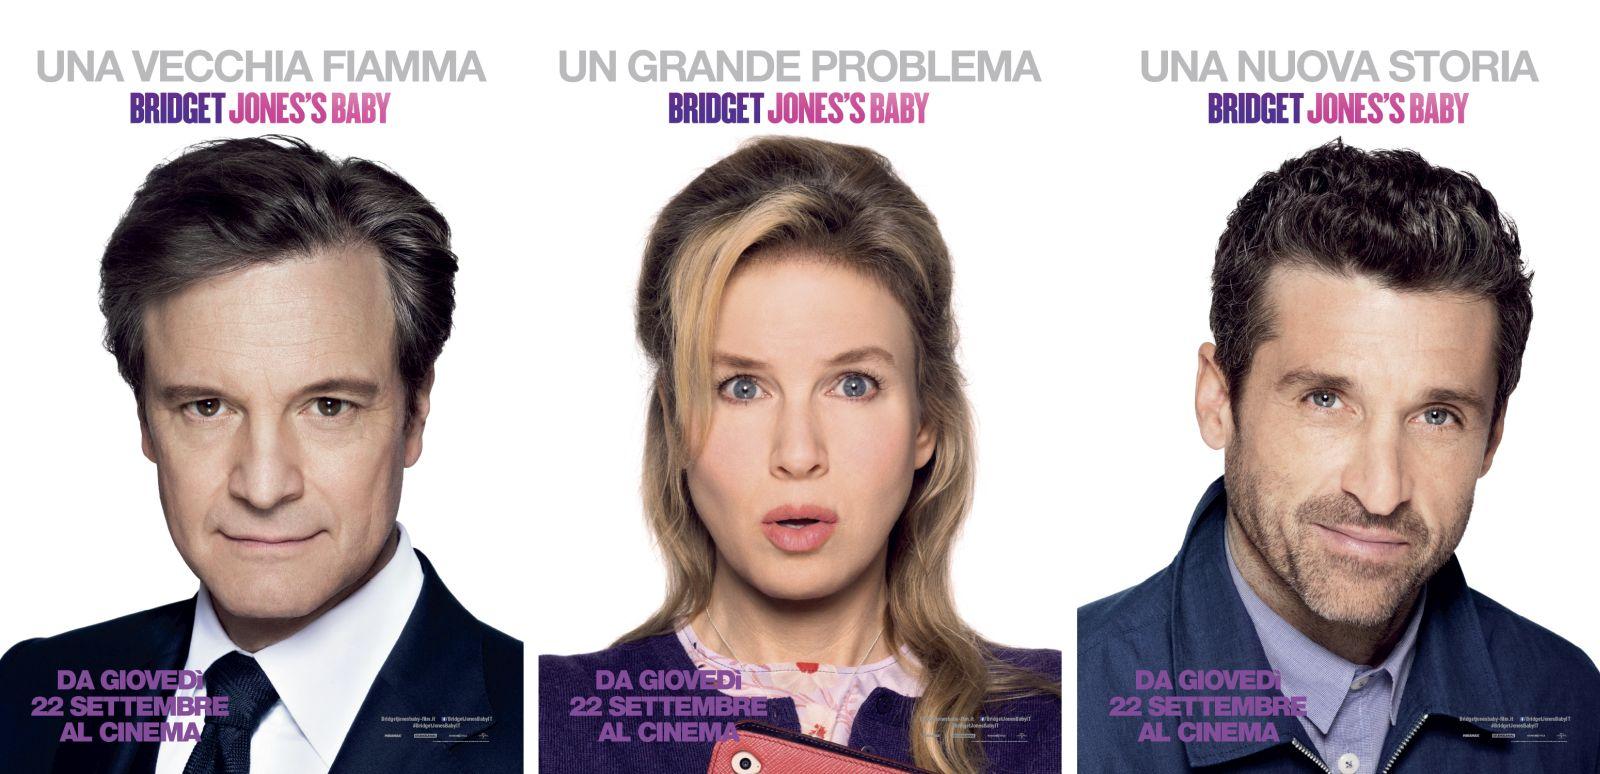 Bridget Jones's Baby: i character poster di Colin Firth, Renée Zellweger e Patrick Dempsey in un'unica immagine